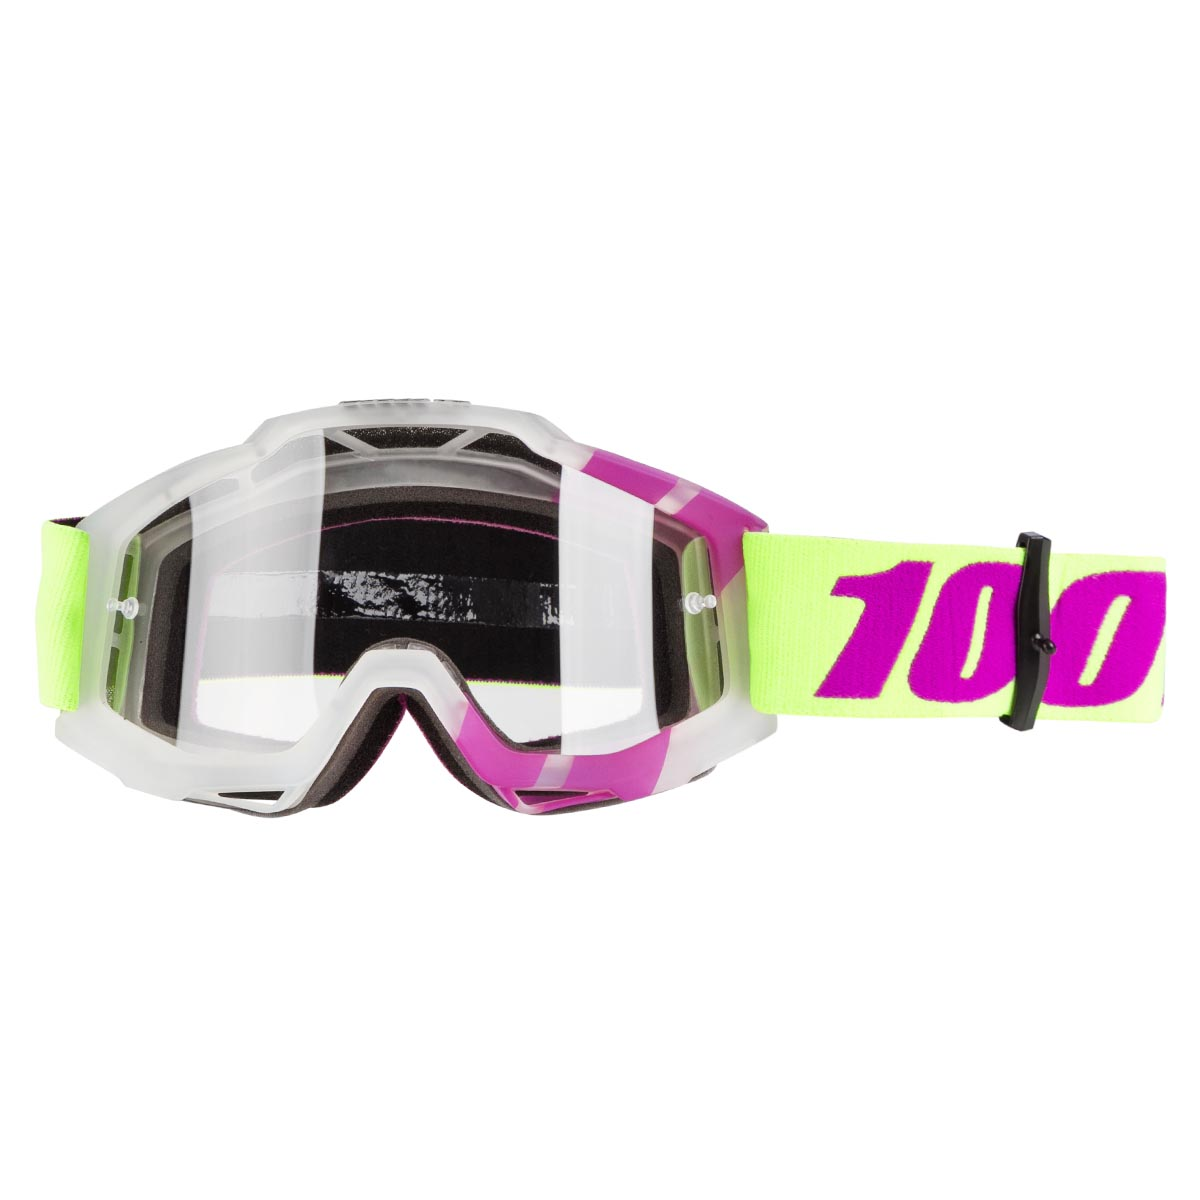 100% Crossbrille The Accuri Tootaloo - Klar Anti-Fog